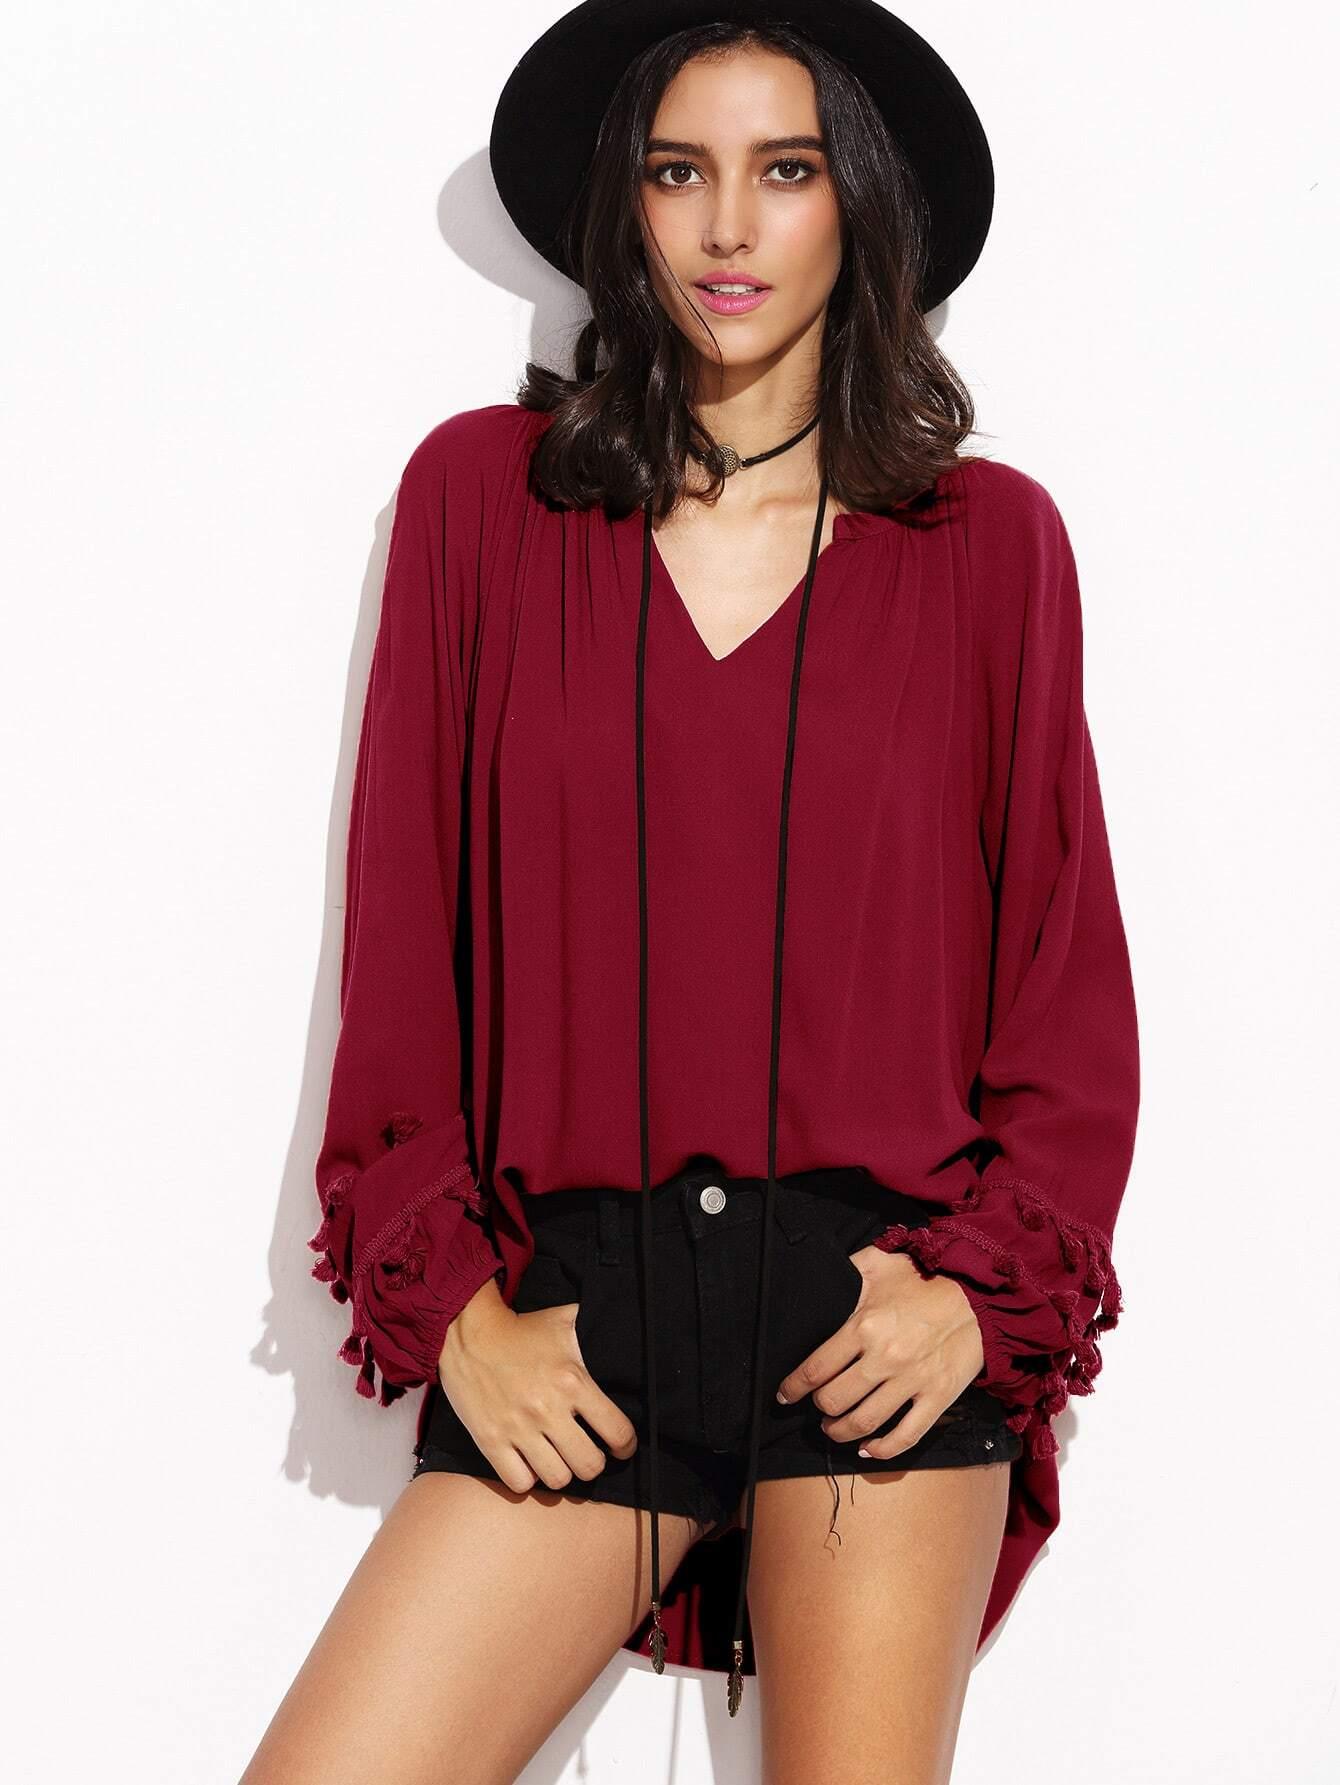 blouse160905003_2